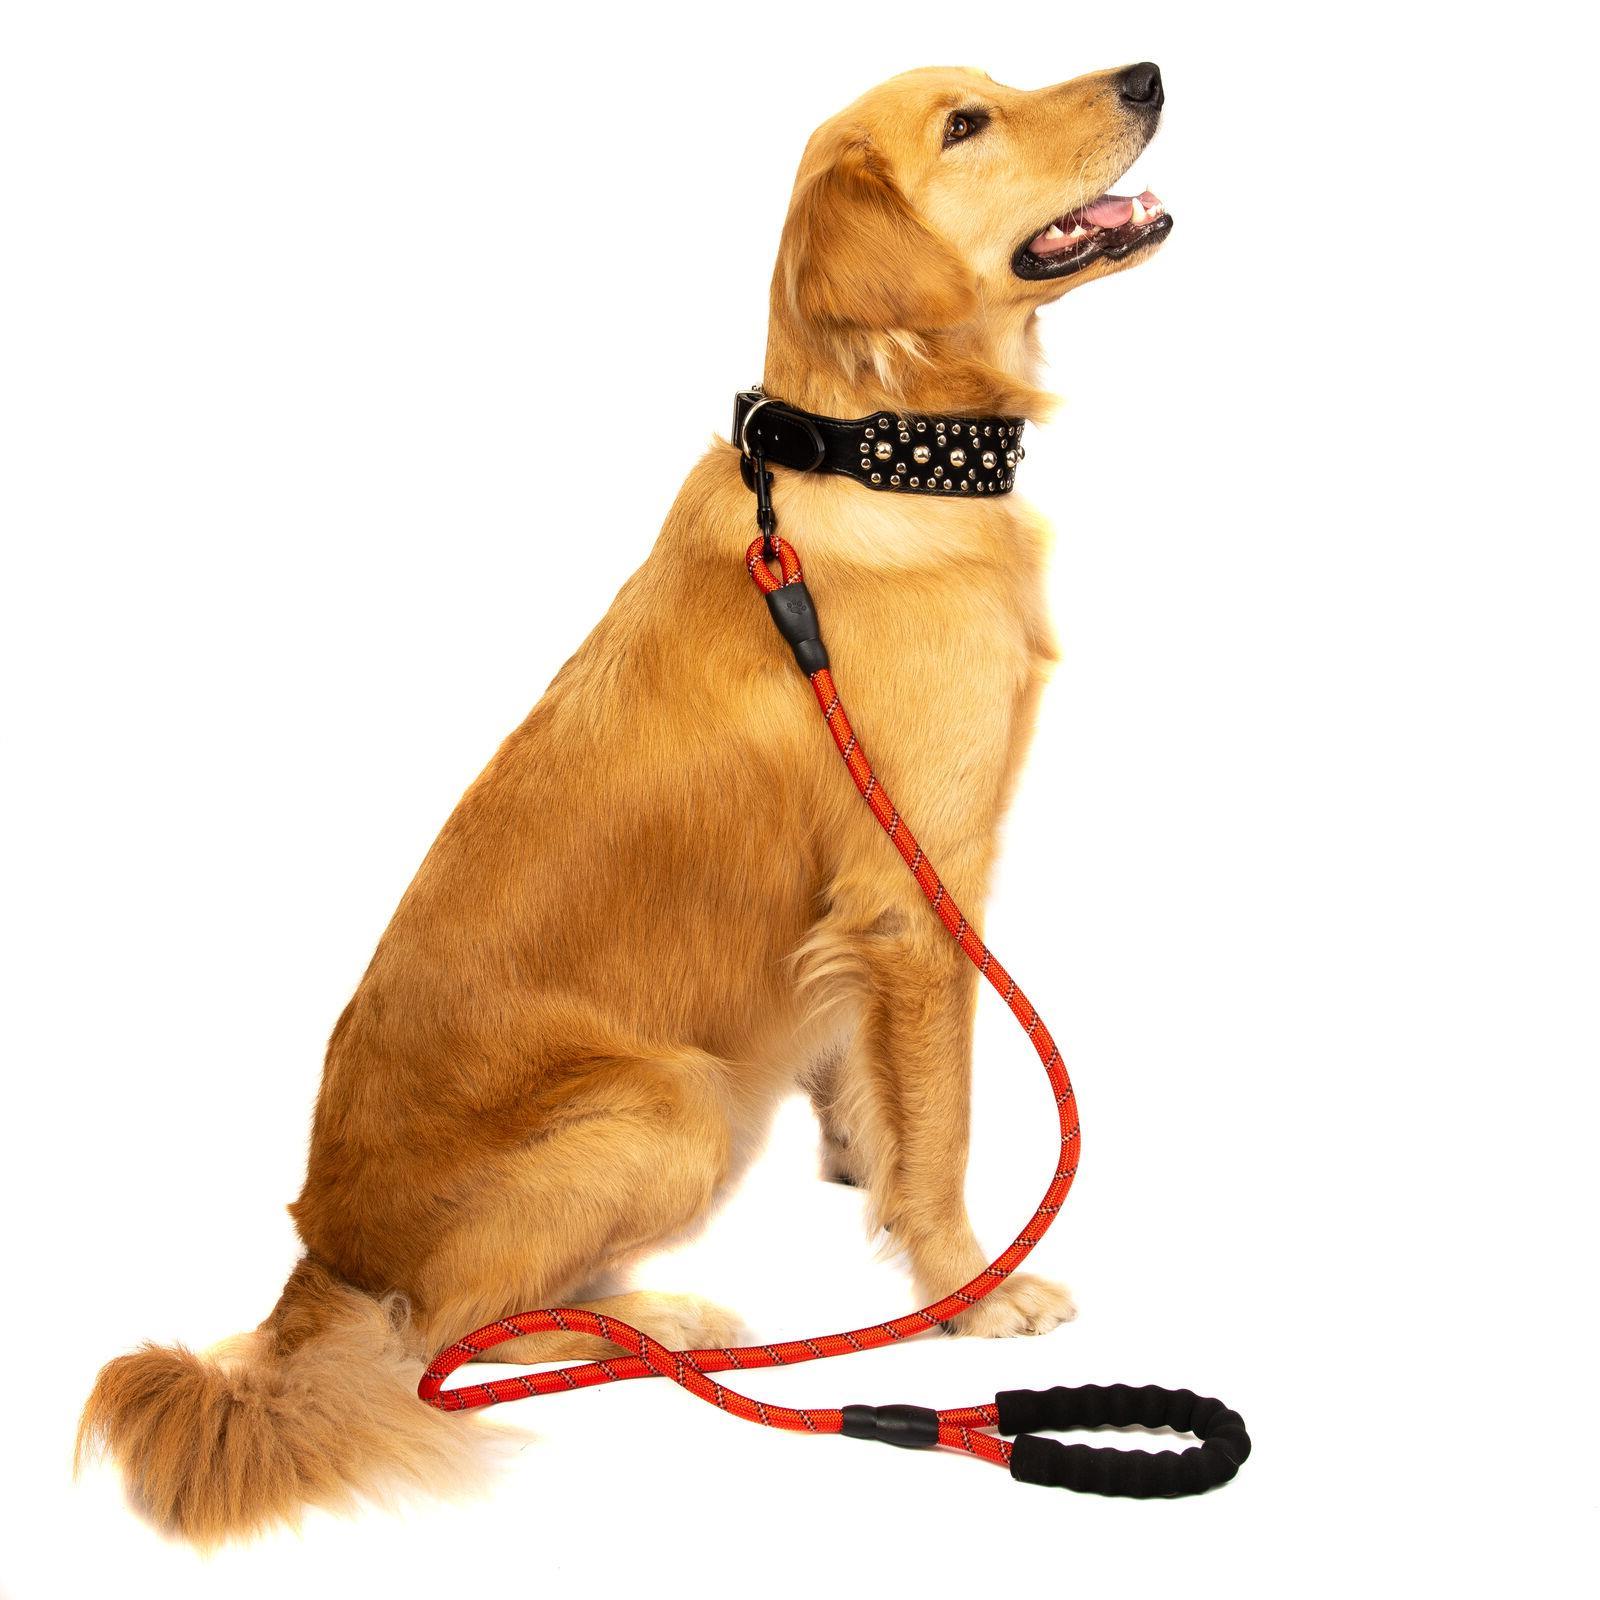 Large Heavy Duty Dog Lead with Training Walking